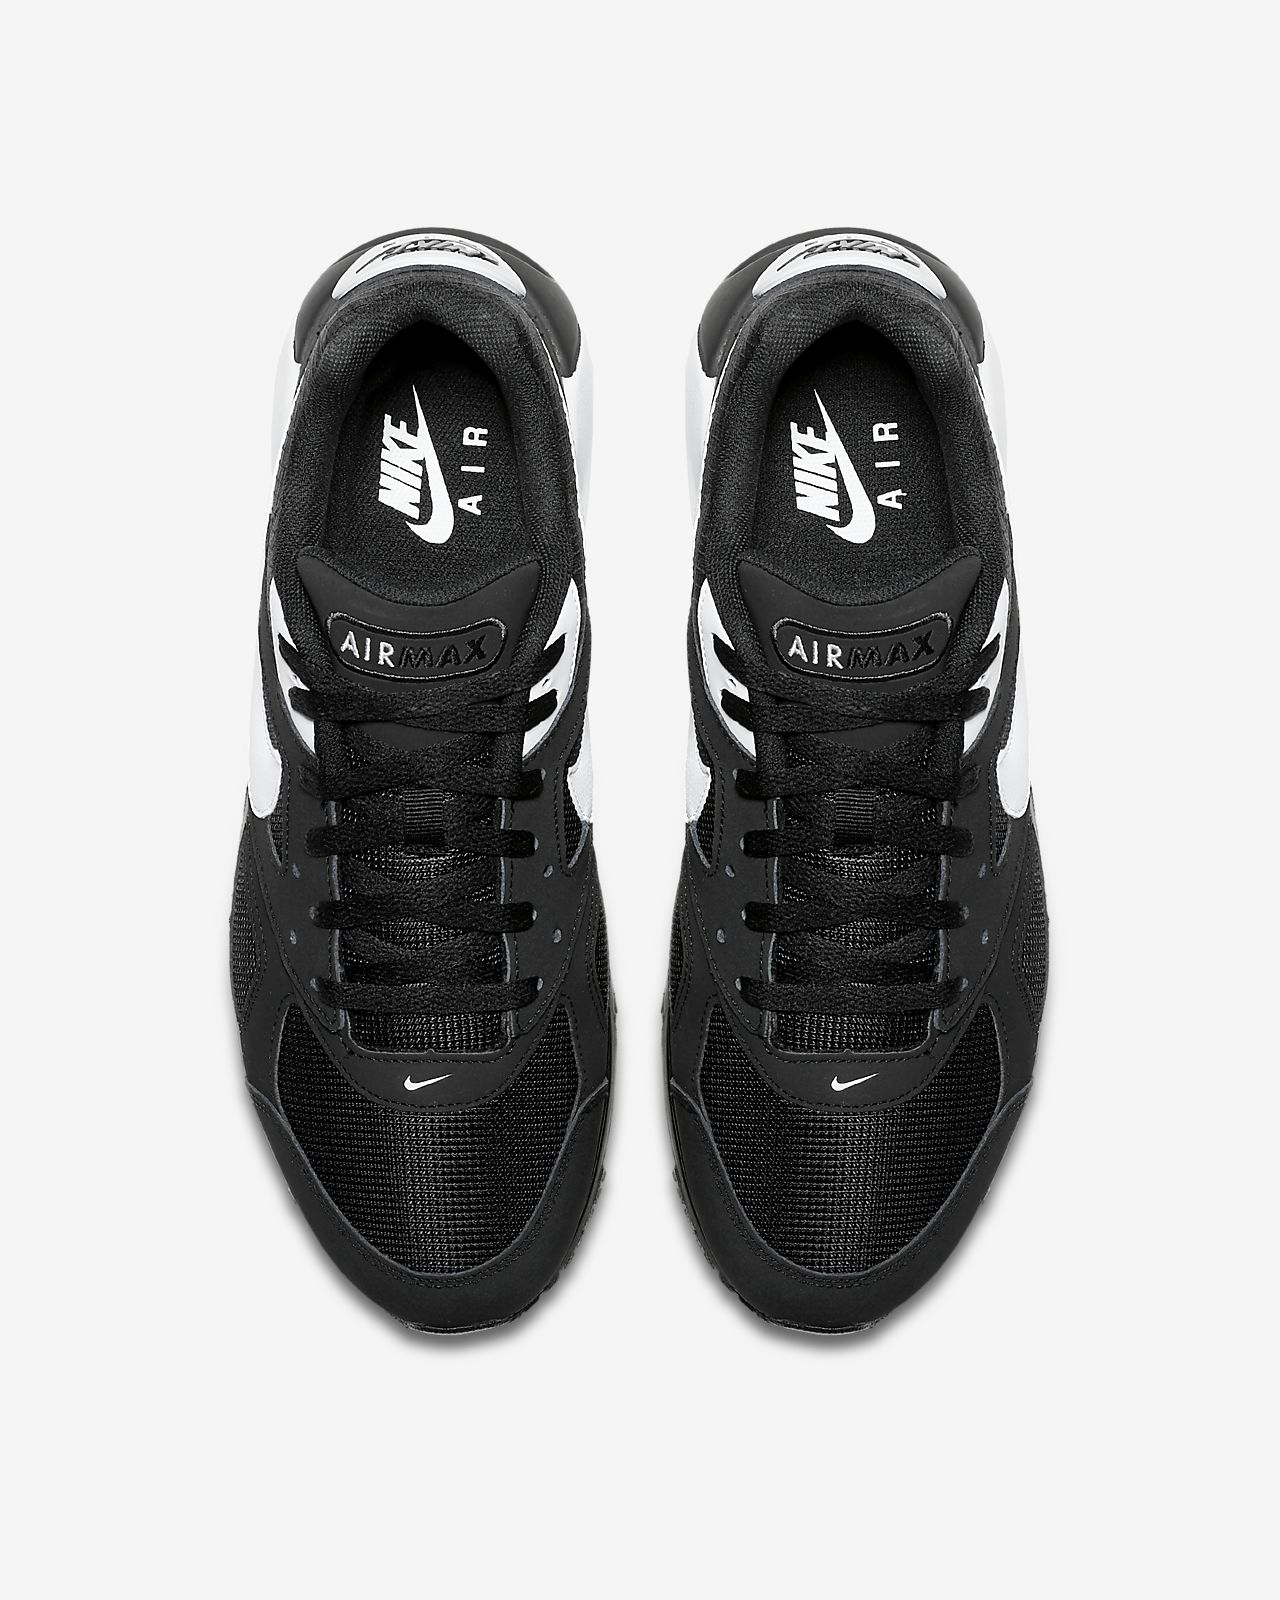 Nike Air Max IVO Herrenschuh